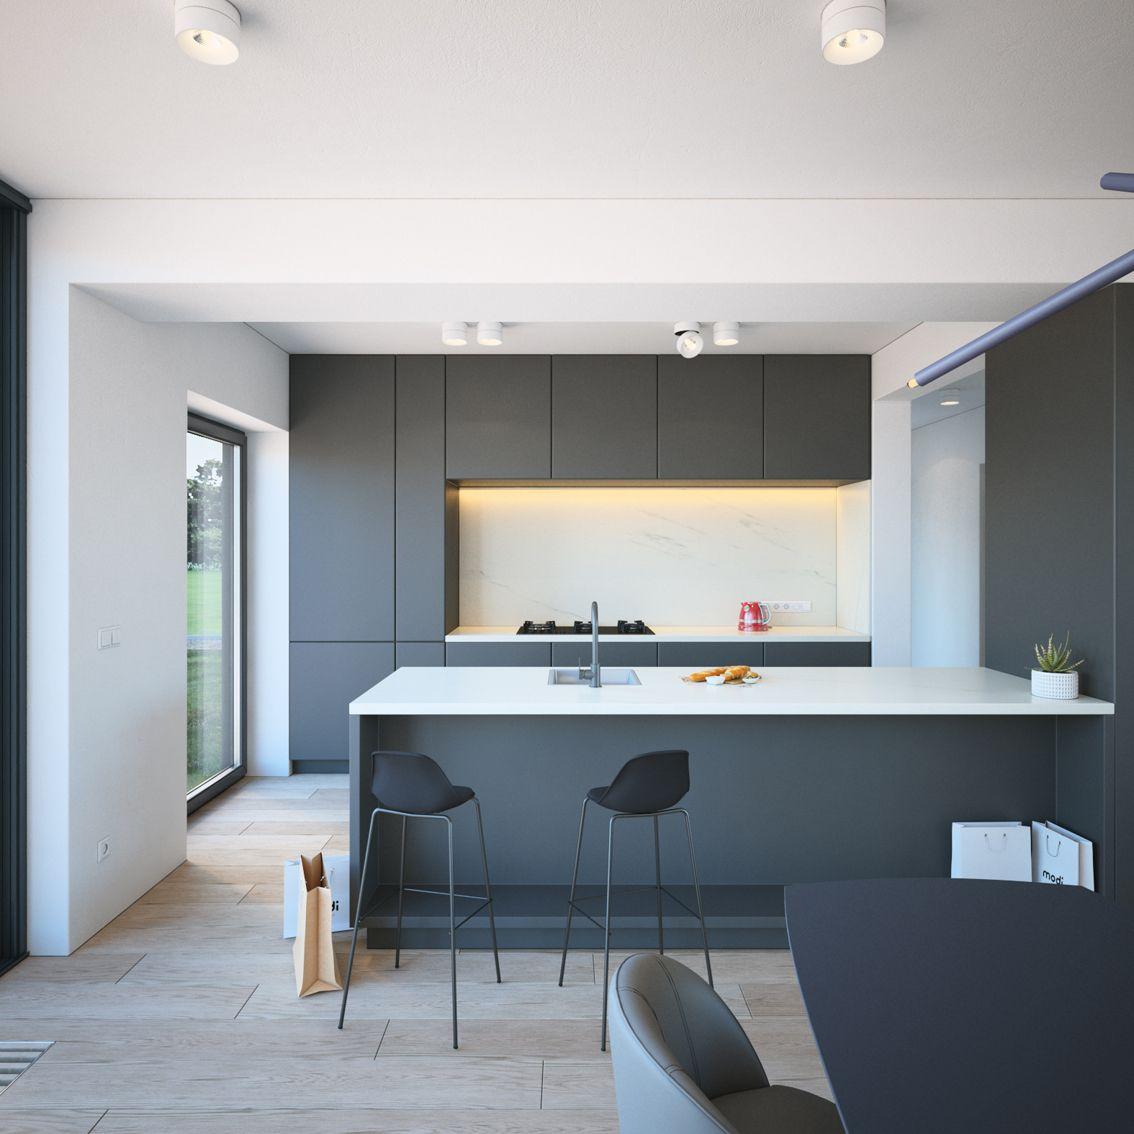 Pin On Nowoczesne Domy Modern Houses